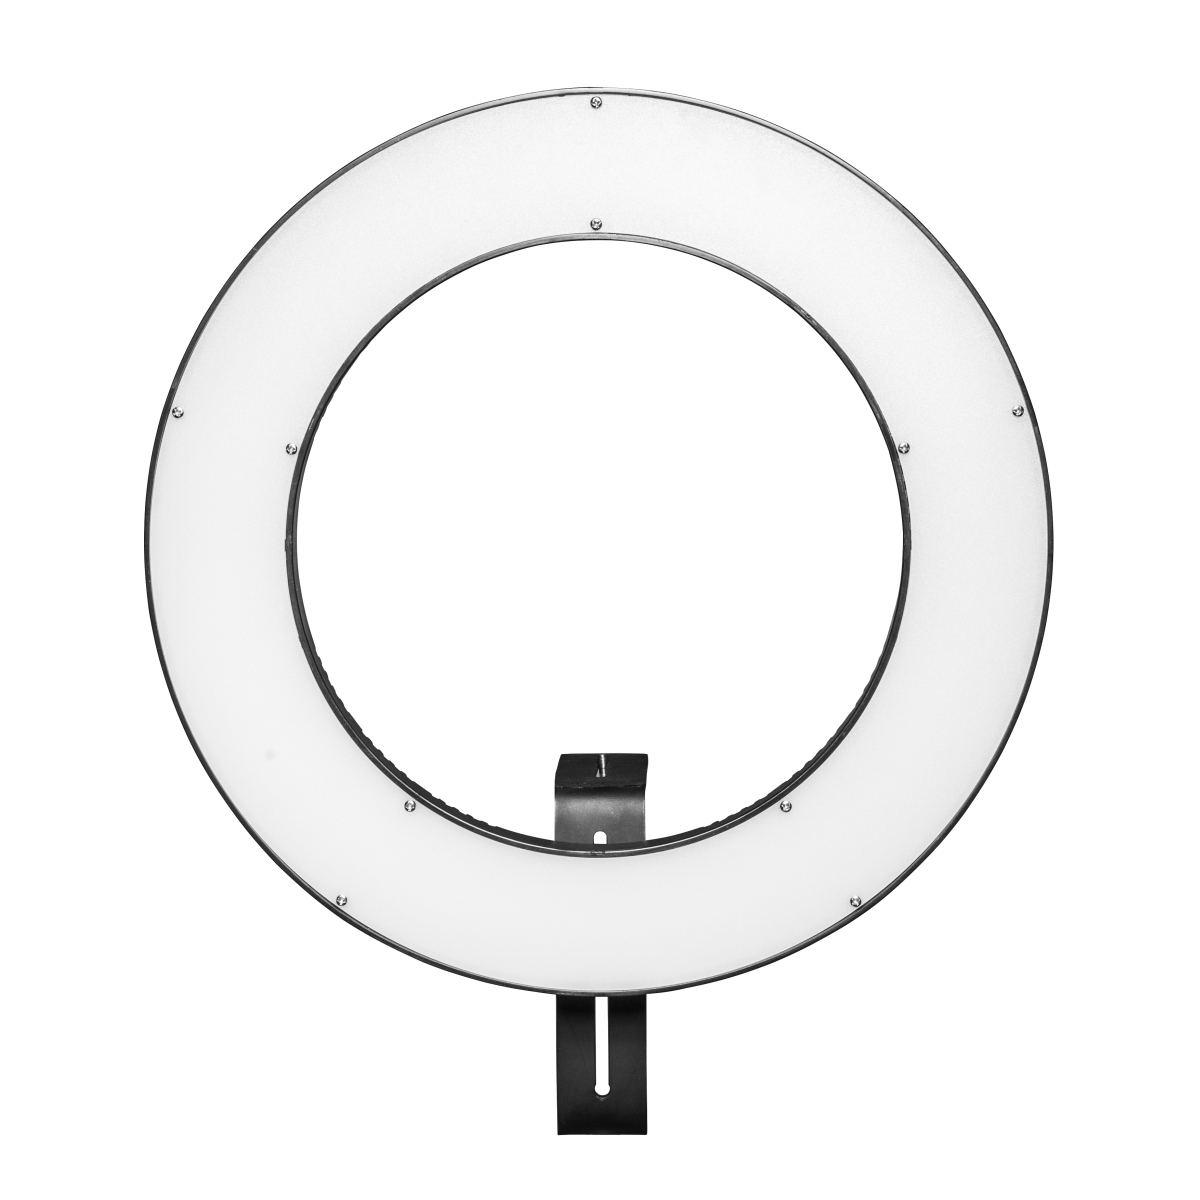 Walimex pro LED Ringlight 380 Bi Color RLL-380BV